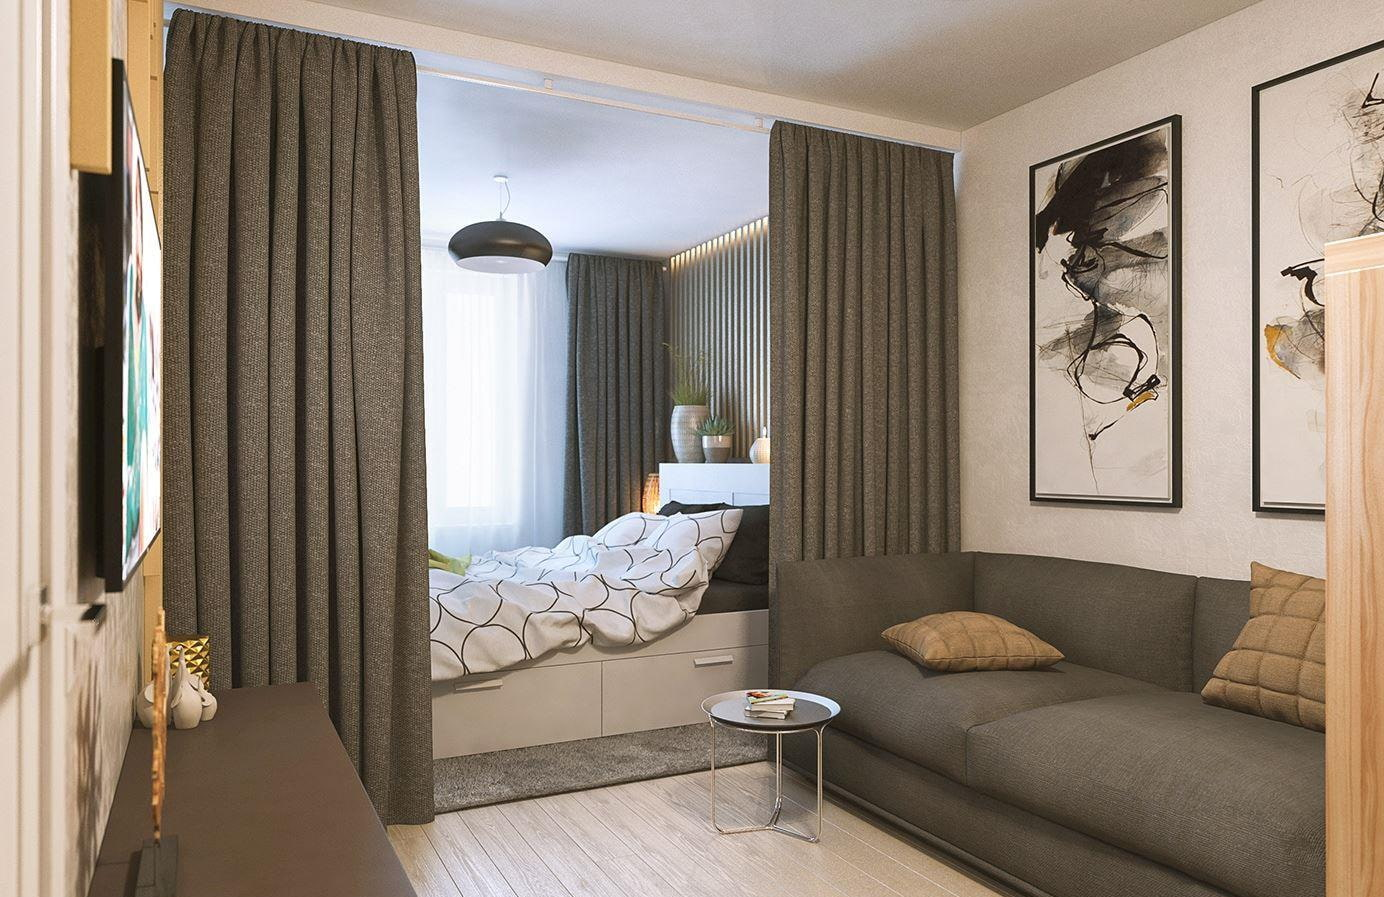 зонирование комнаты шторами идеи интерьер